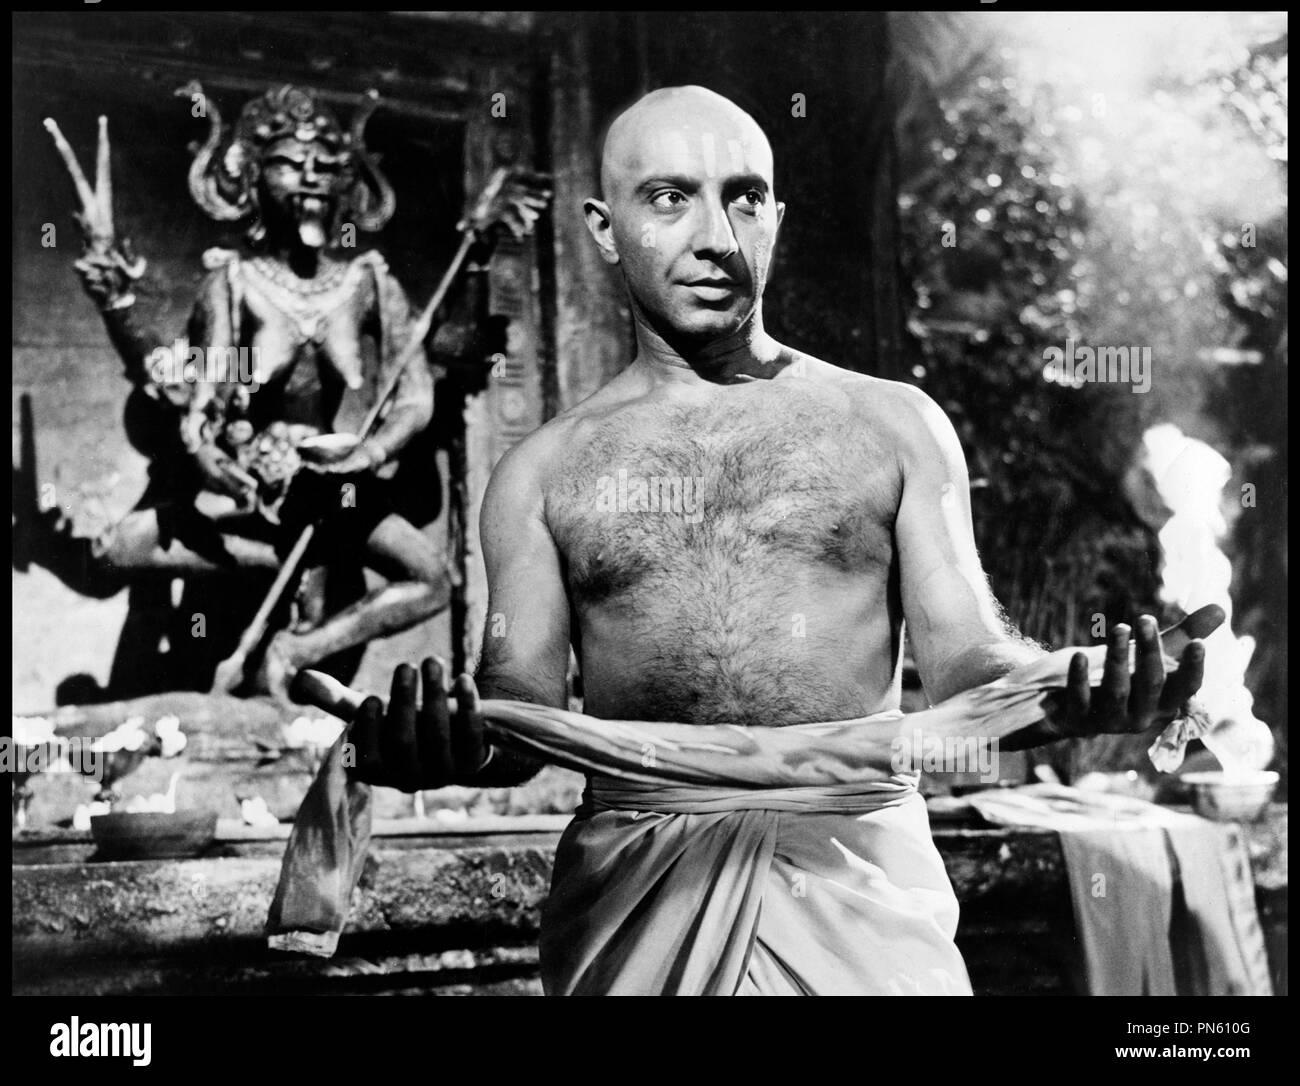 Prod DB © DR LES ETRANGLEURS DE BOMBAY (THE STRANGLERS OF BOMBAY) de Terence Fisher 1960 GB avec George Pastell Thug, secte fanatique, dŽesse Shiva - Stock Image